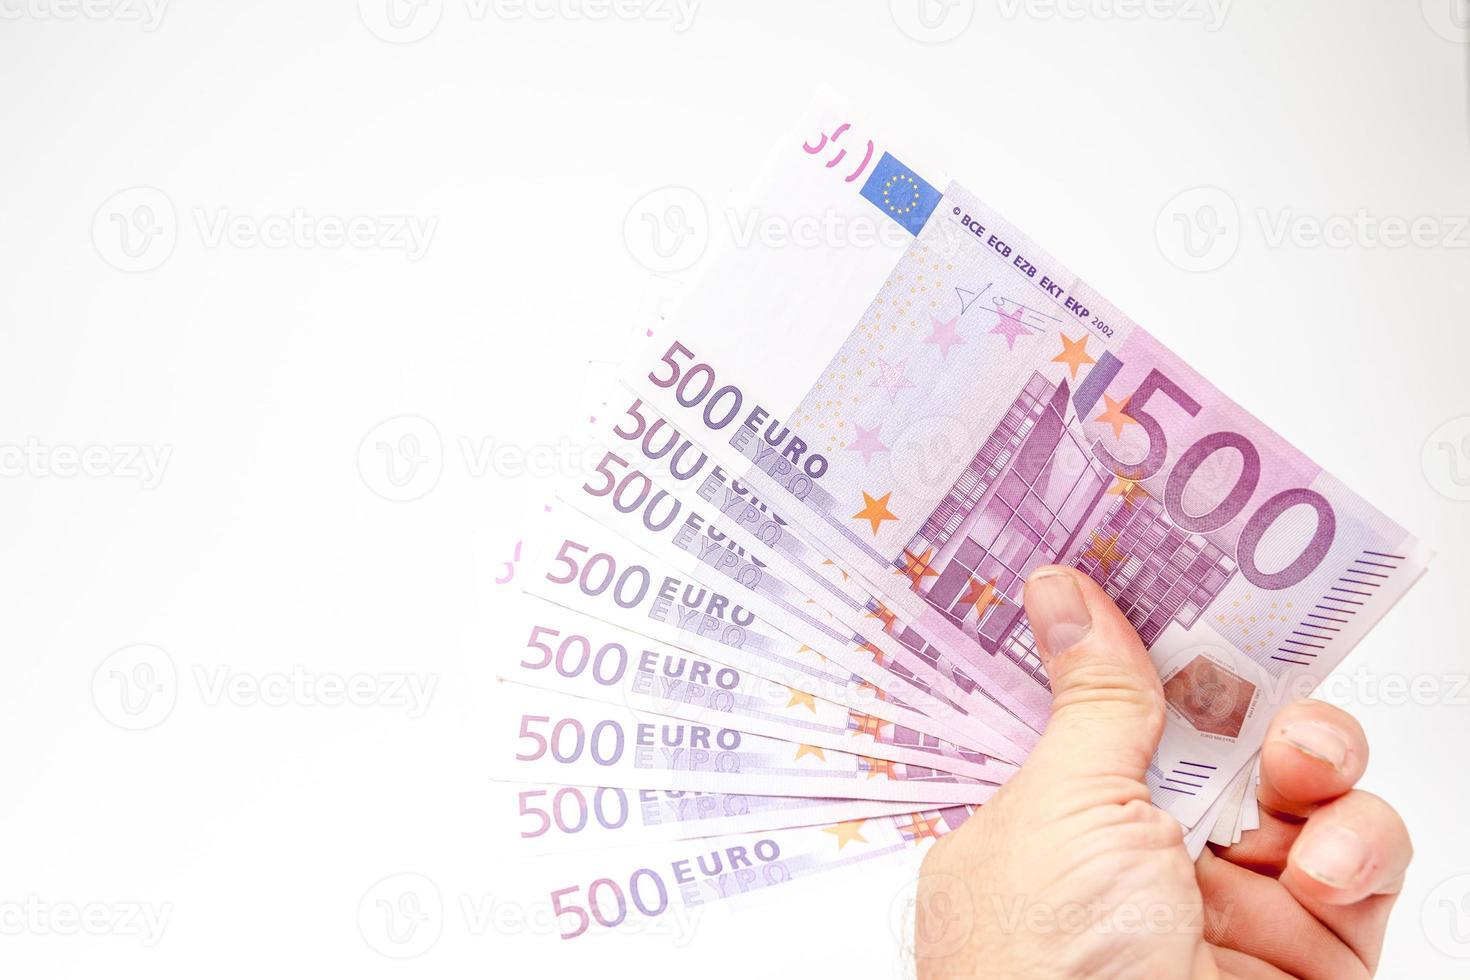 do euro foto